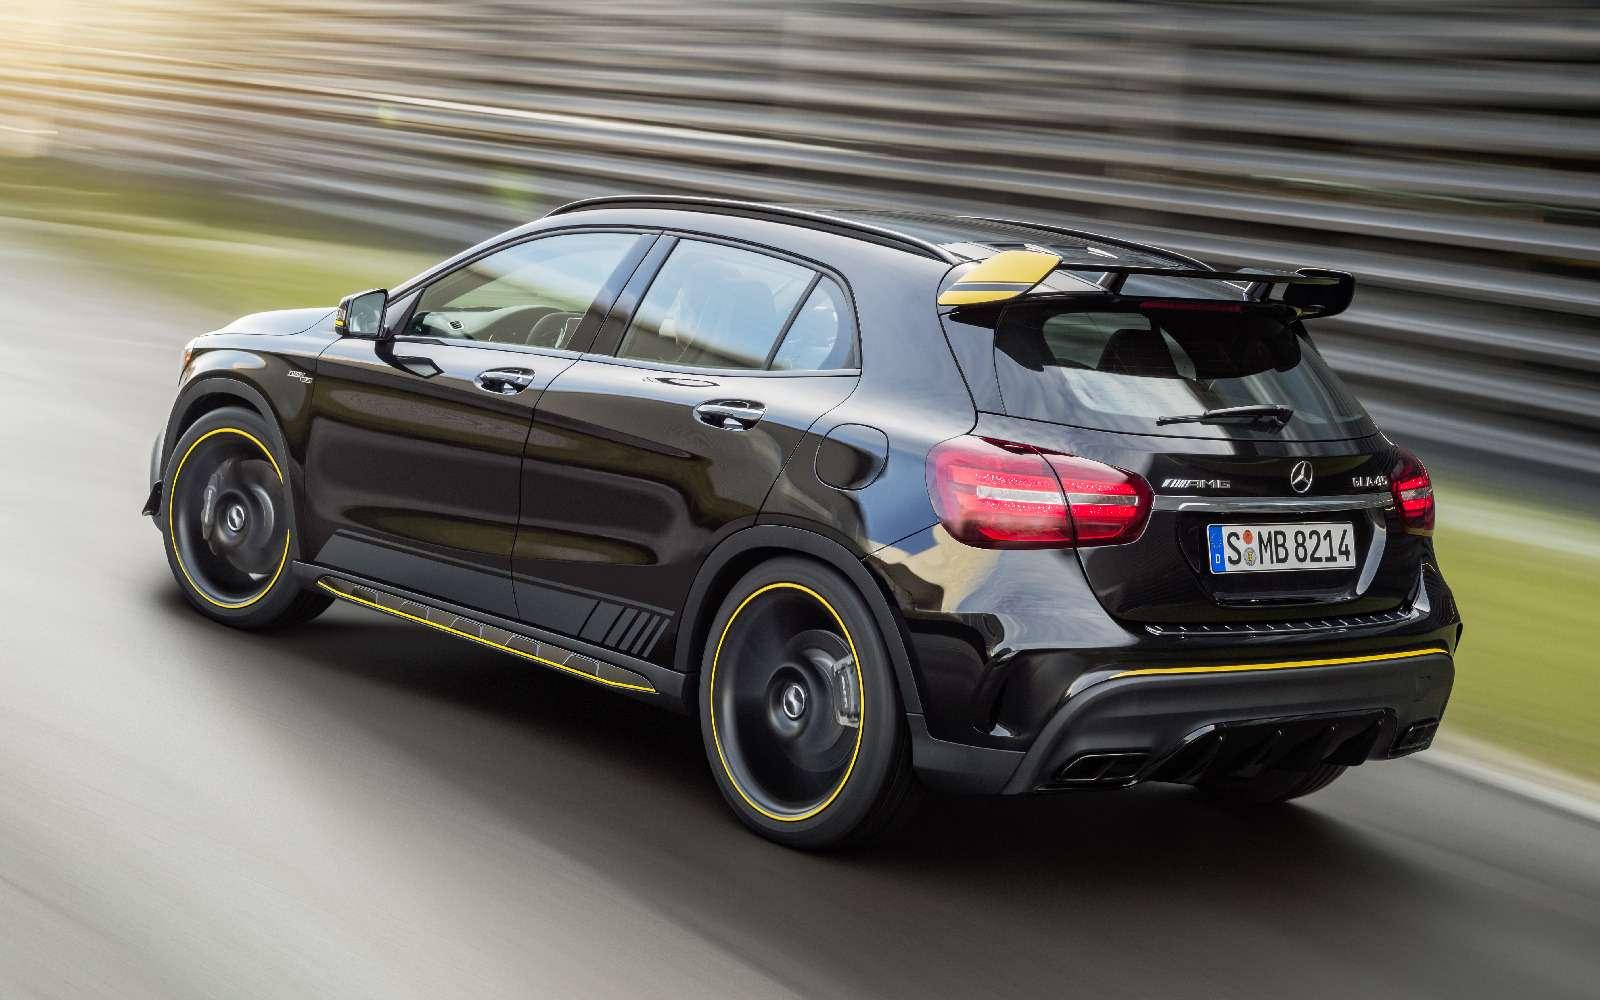 Mercedes-Benz GLA стал краше, ноне просторнее— фото 690087